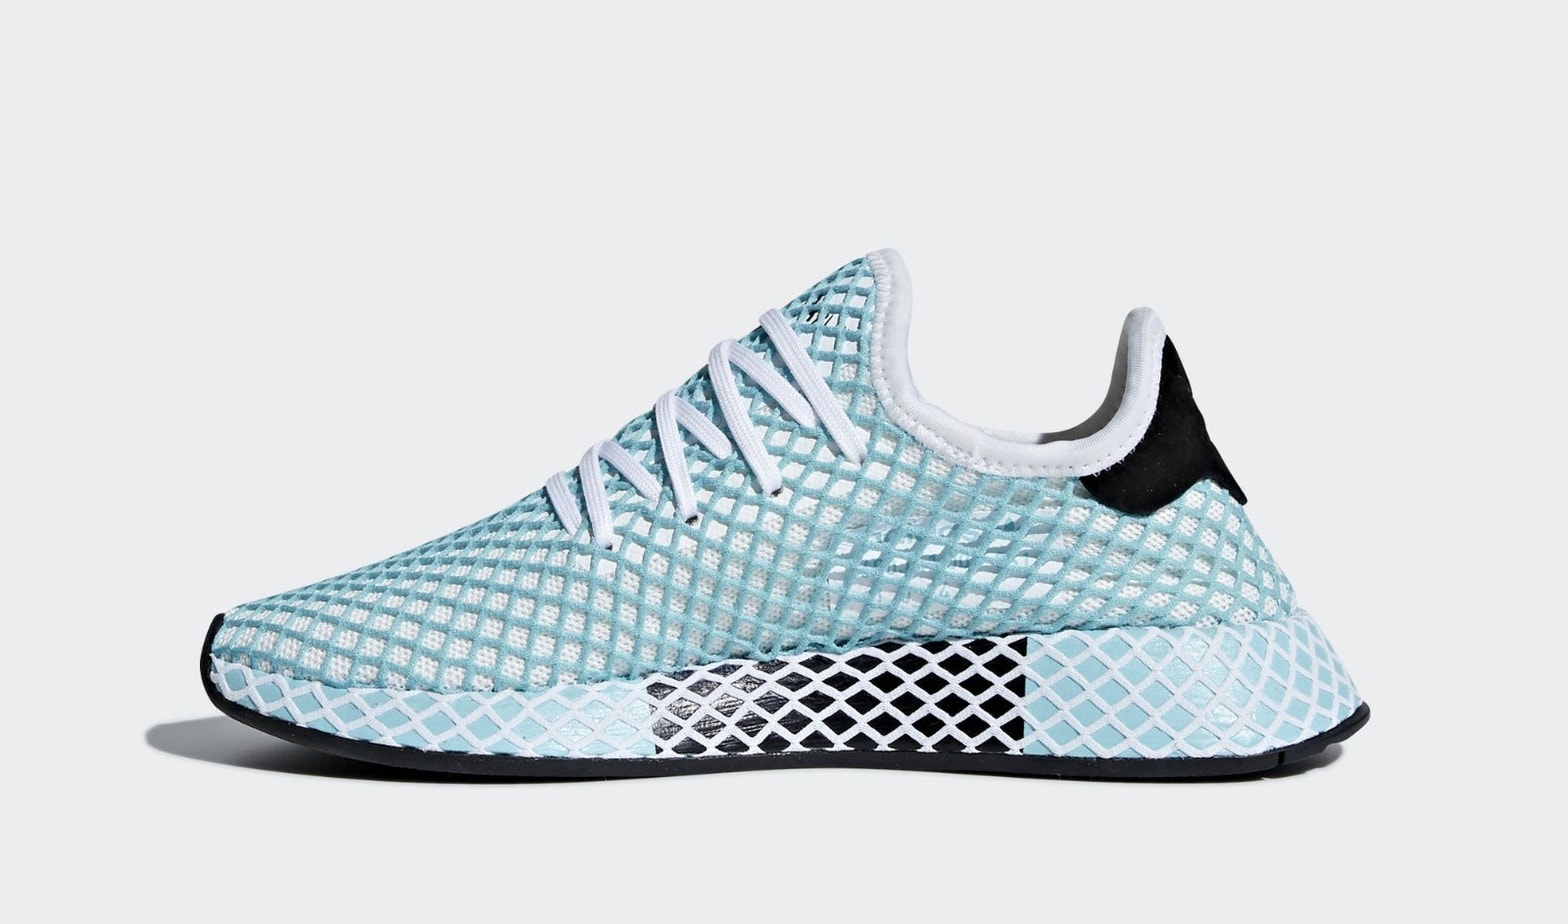 huge discount 48dee 11a37 Parley x adidas Deerupt Release Date Summer 2018. Color Ftwr WhiteFtwr  WhiteBlue Spirit